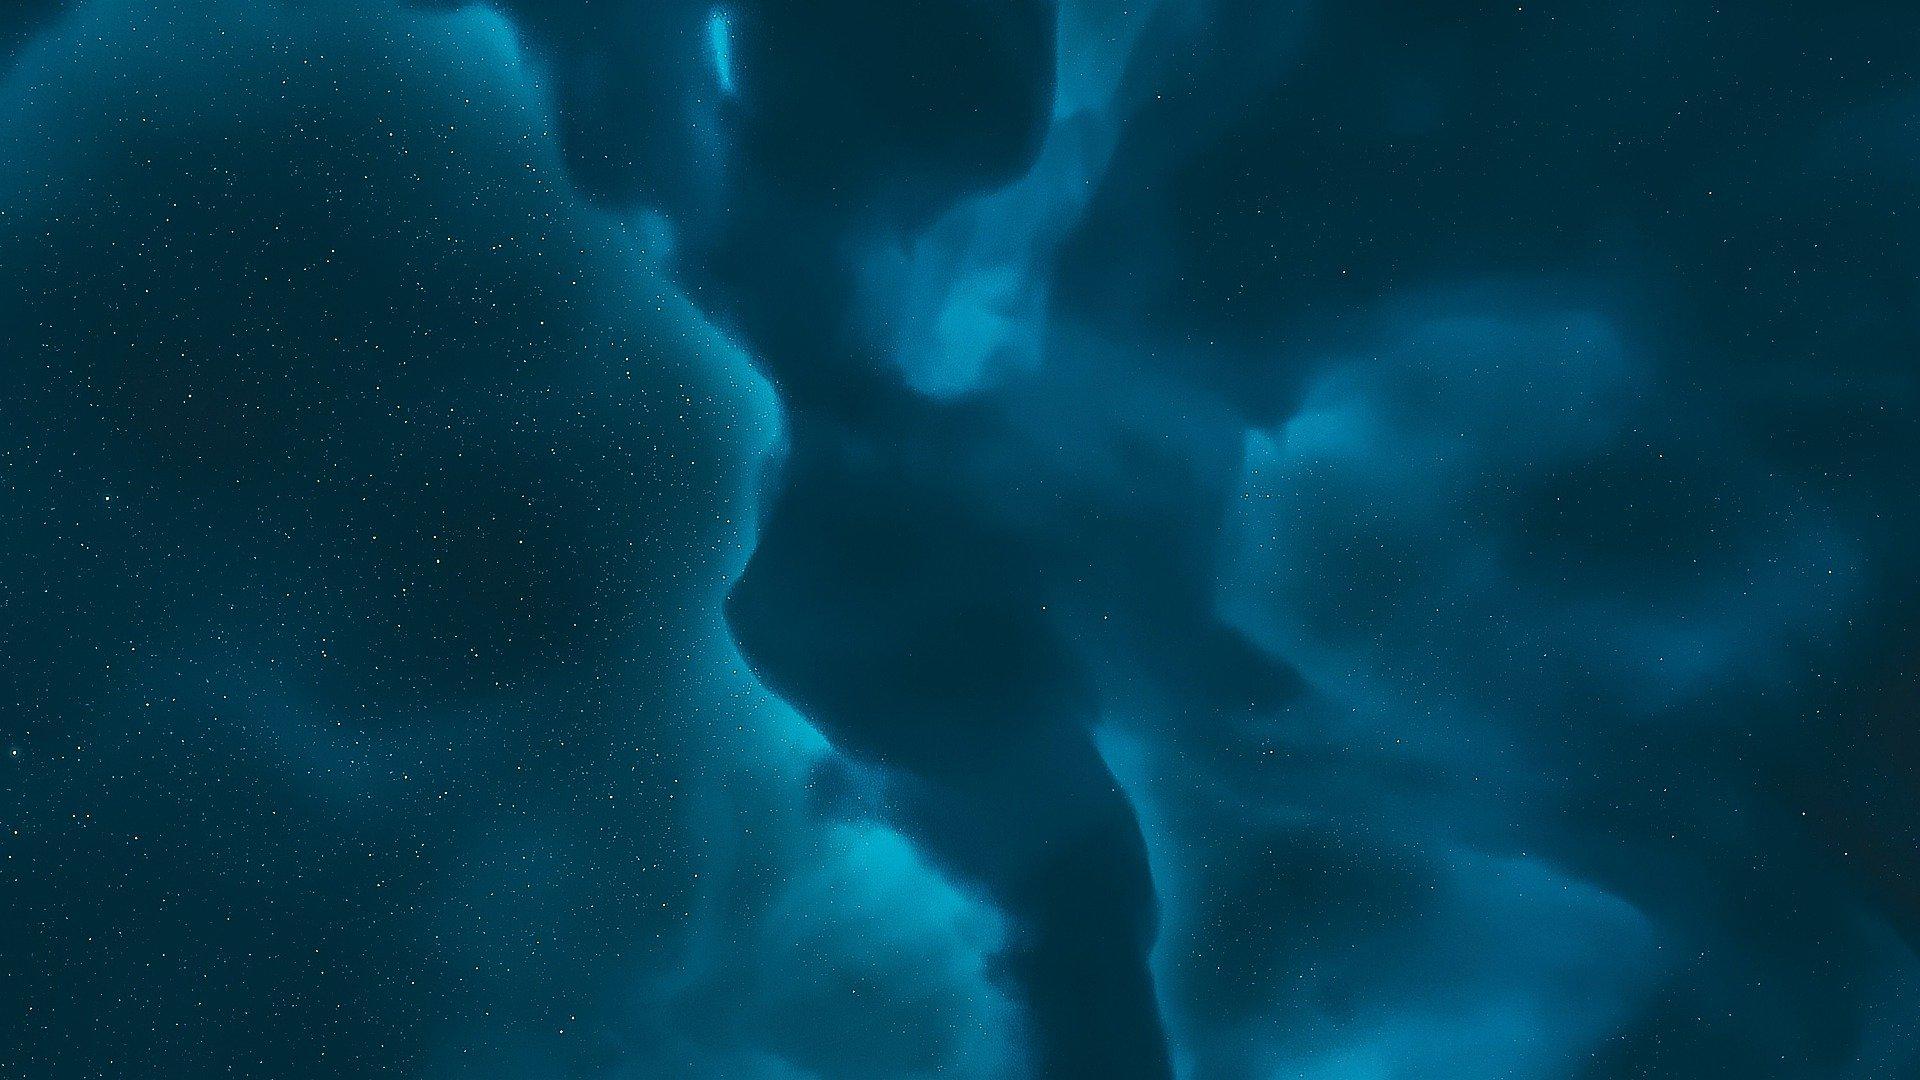 polar-lights-5858651_1920-1